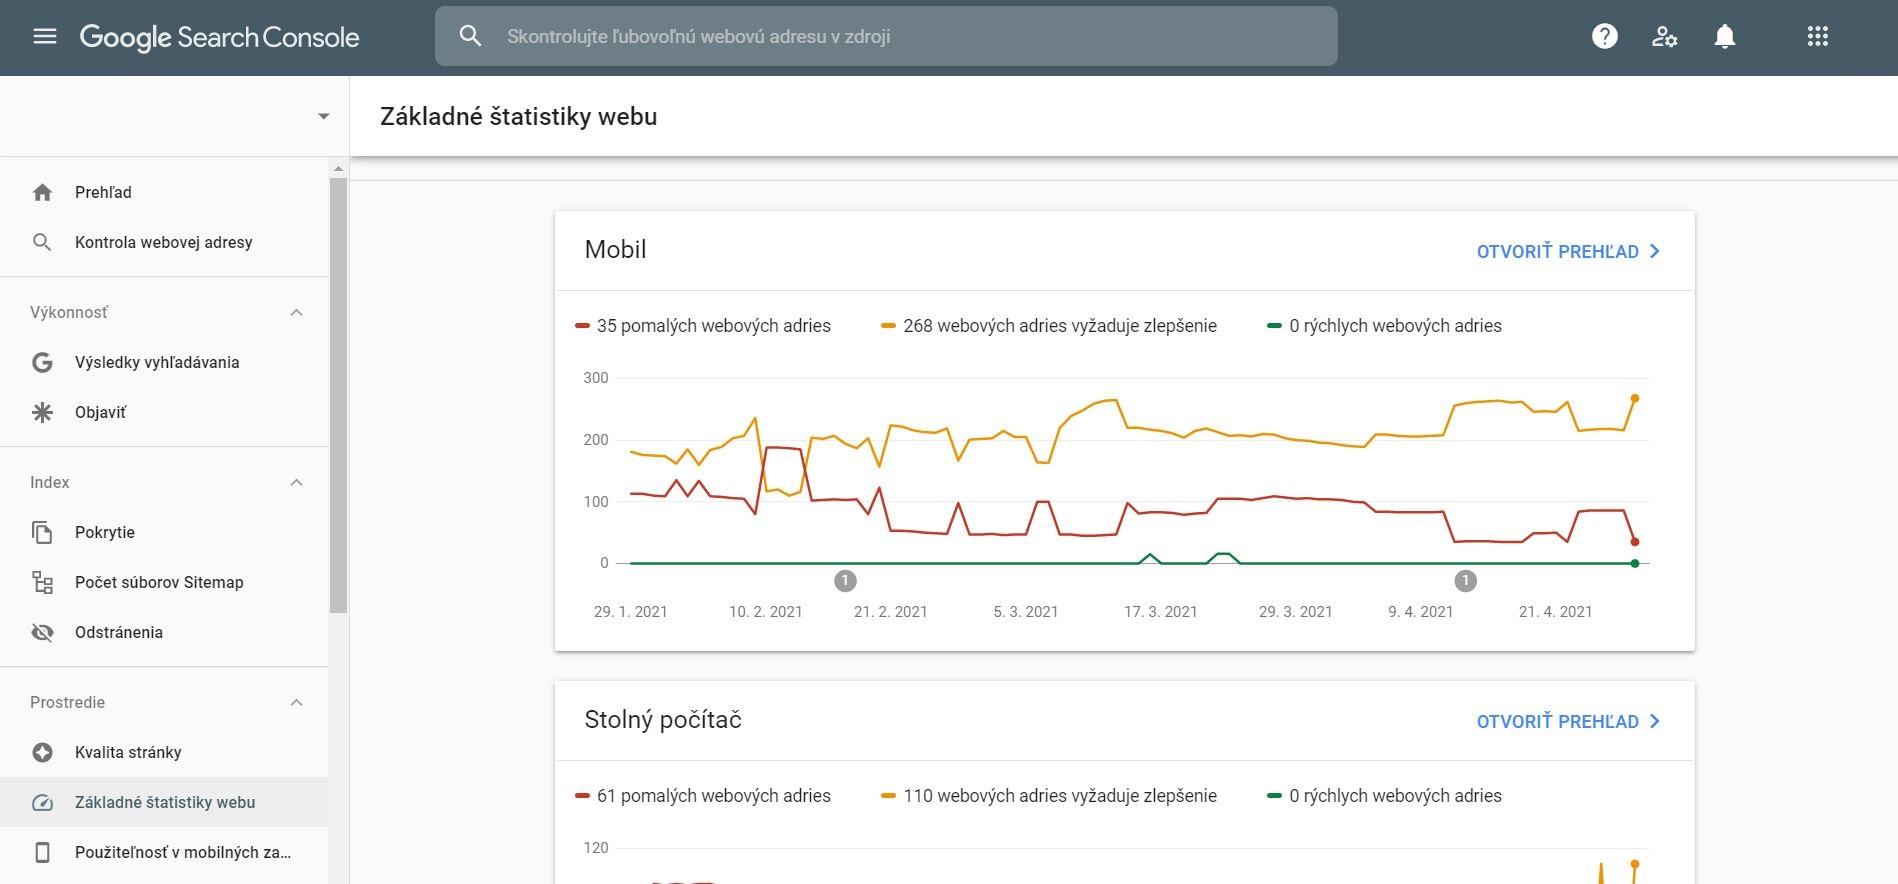 Google Search Console - štatistiky